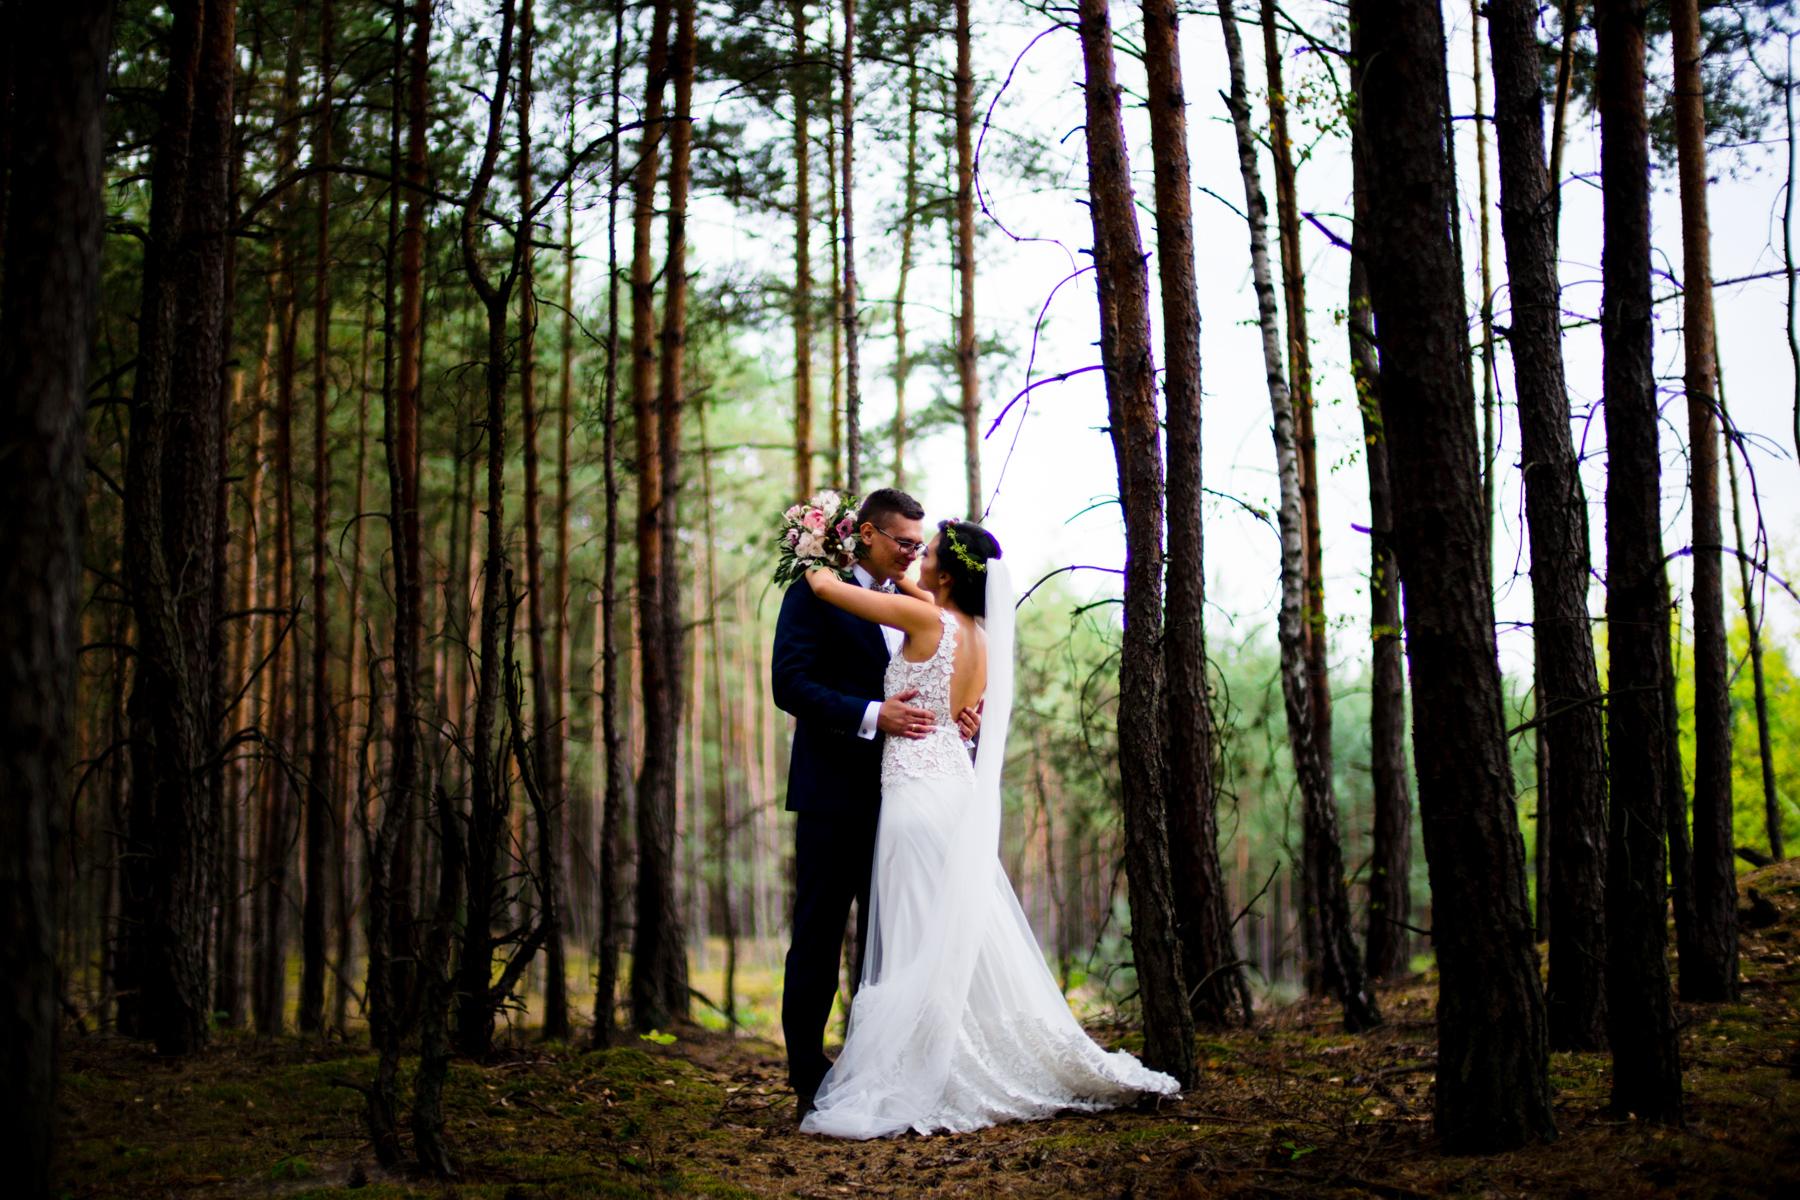 narracia-wygledacz-photographe-mariage-portfolio-56.jpg